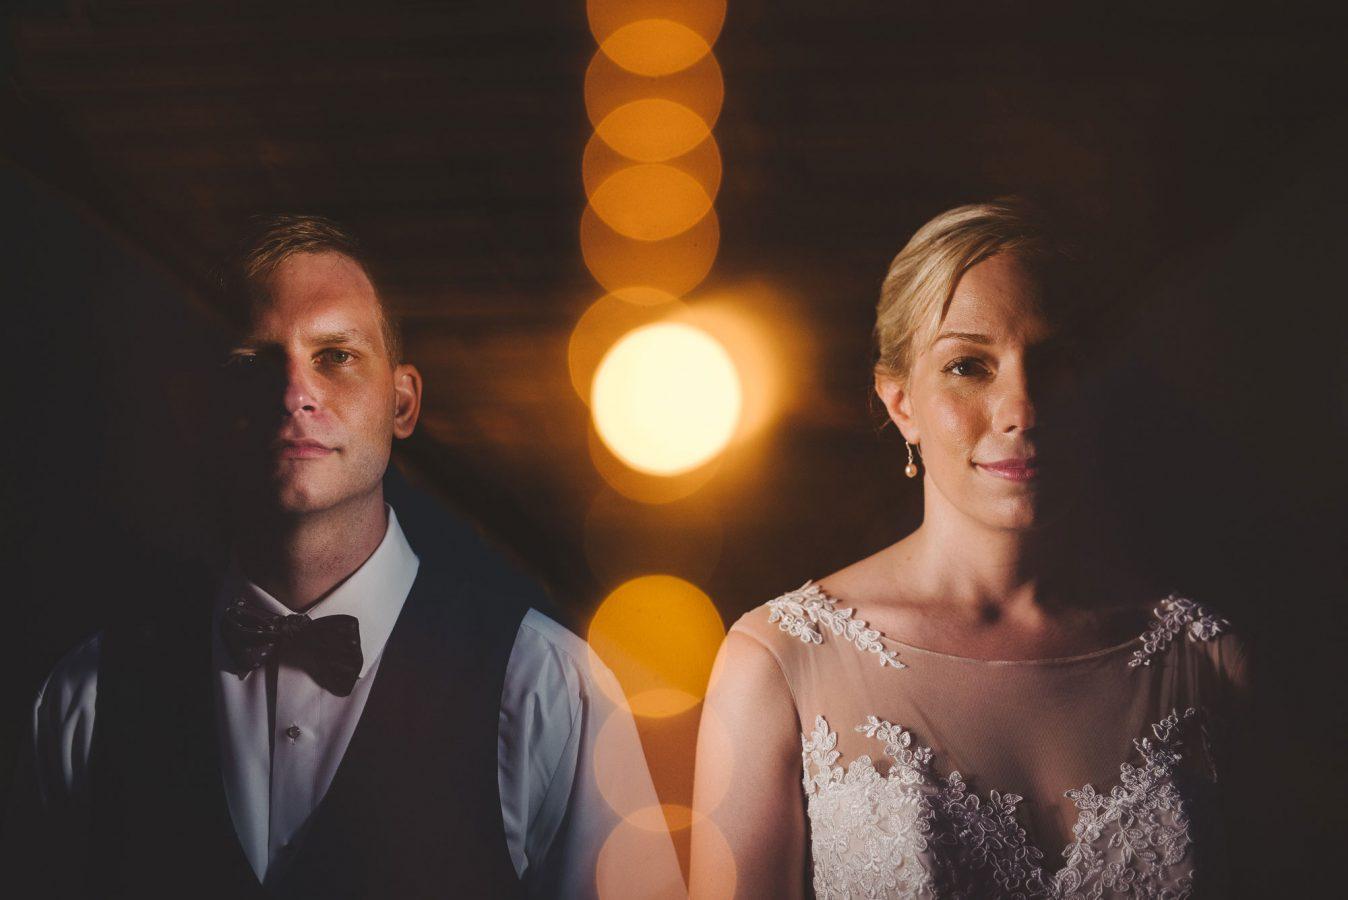 fete-photography-weddings-2017-010